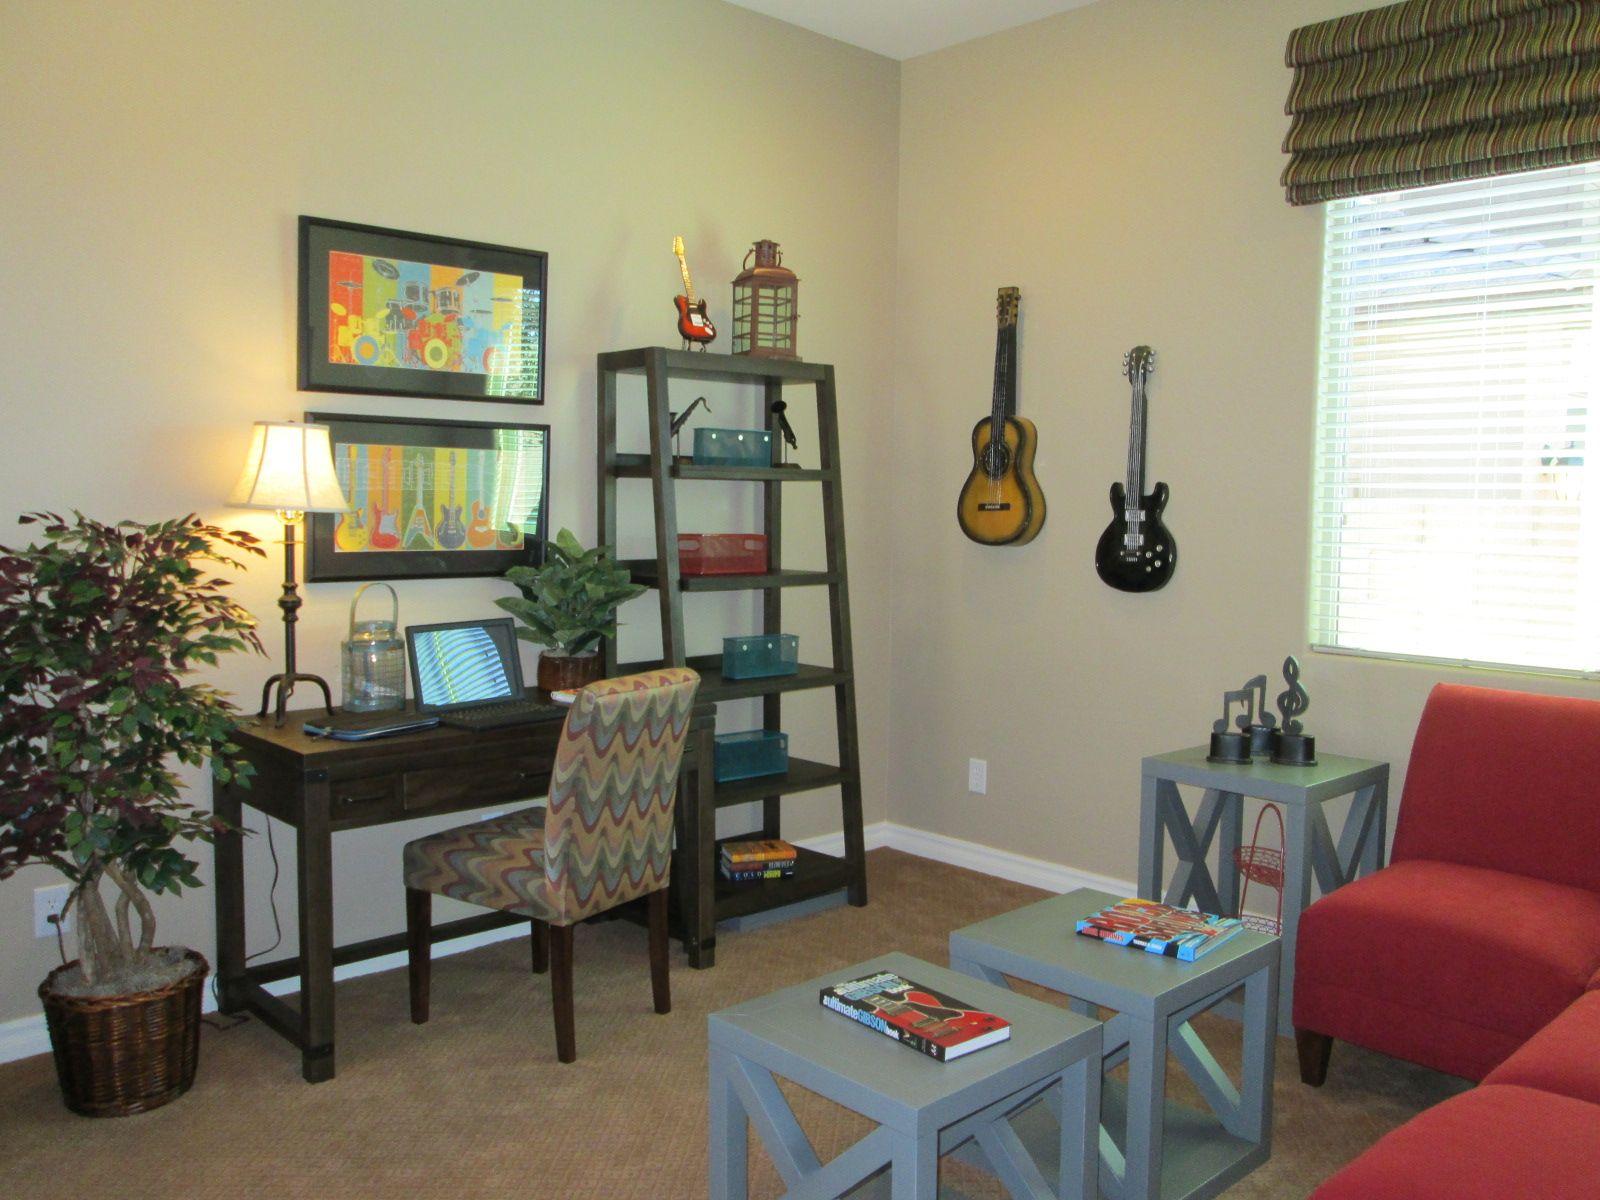 Music room. | Family living rooms, Family room, Room